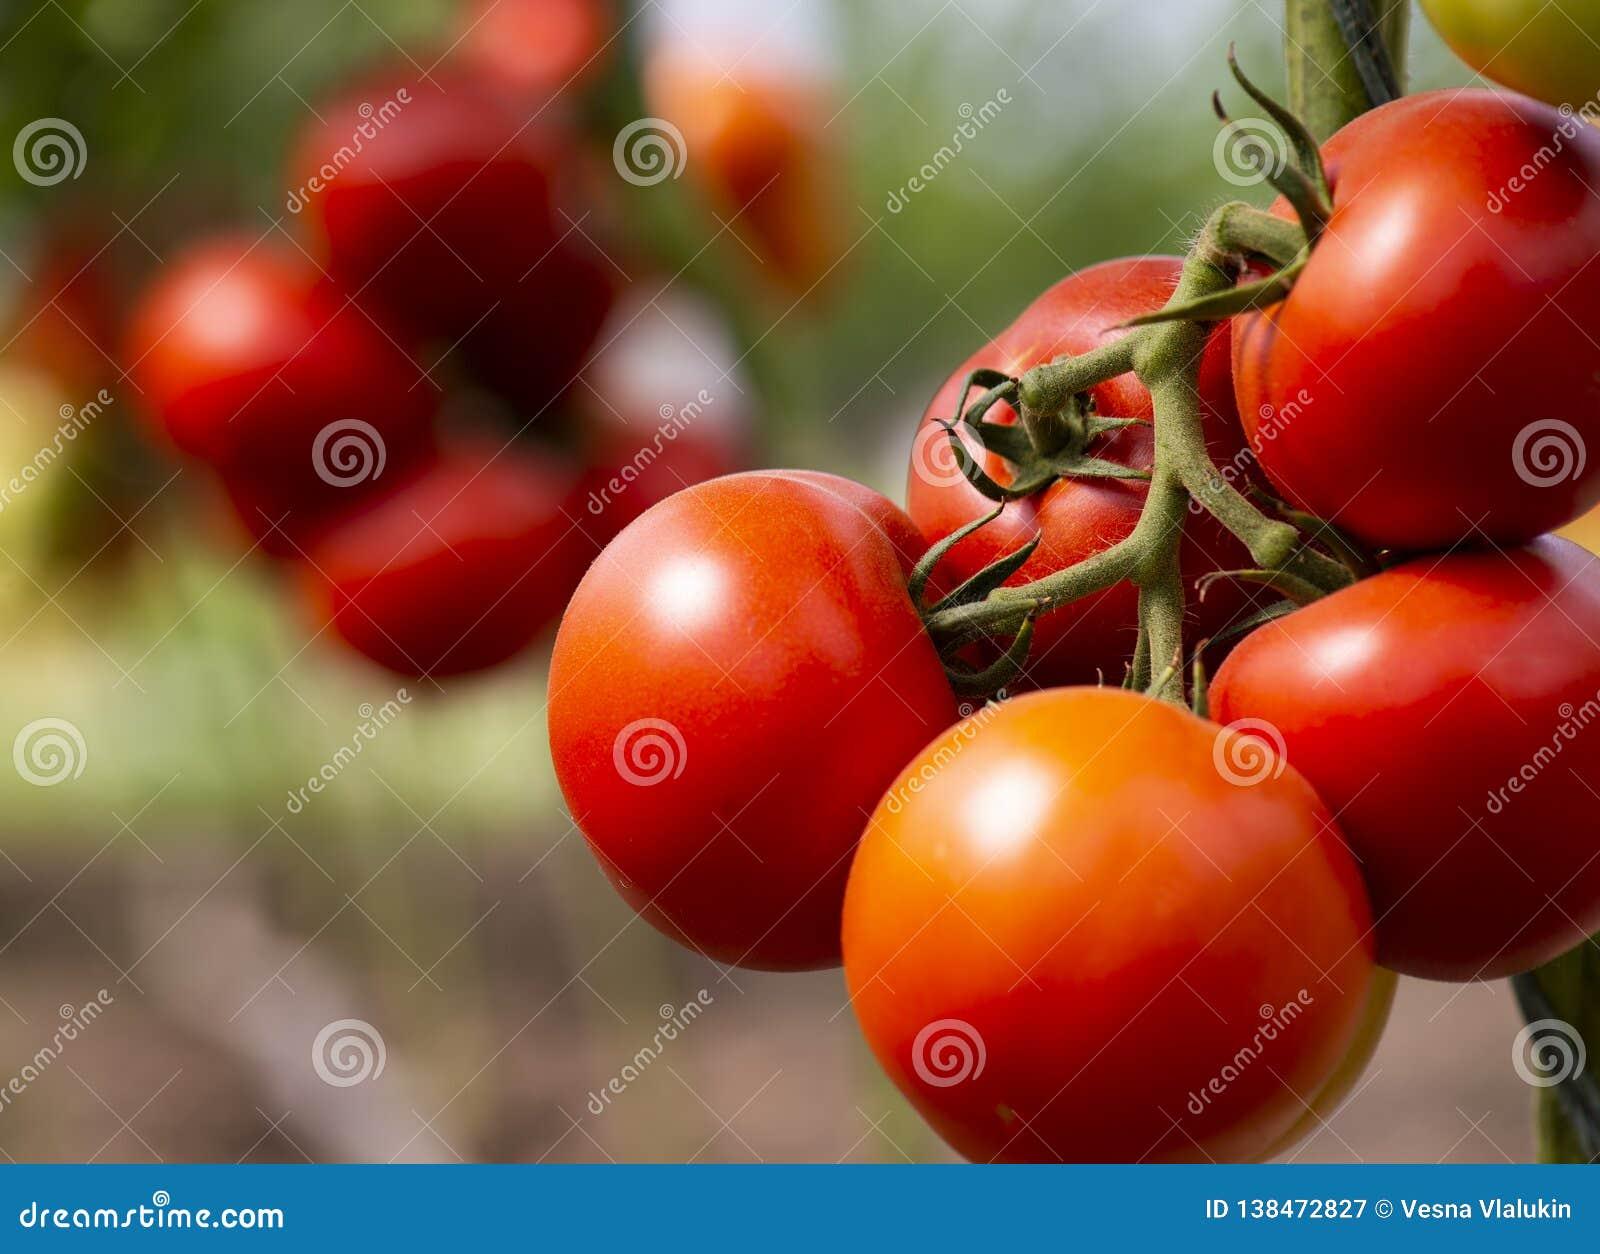 Mature cherry tomato excellent